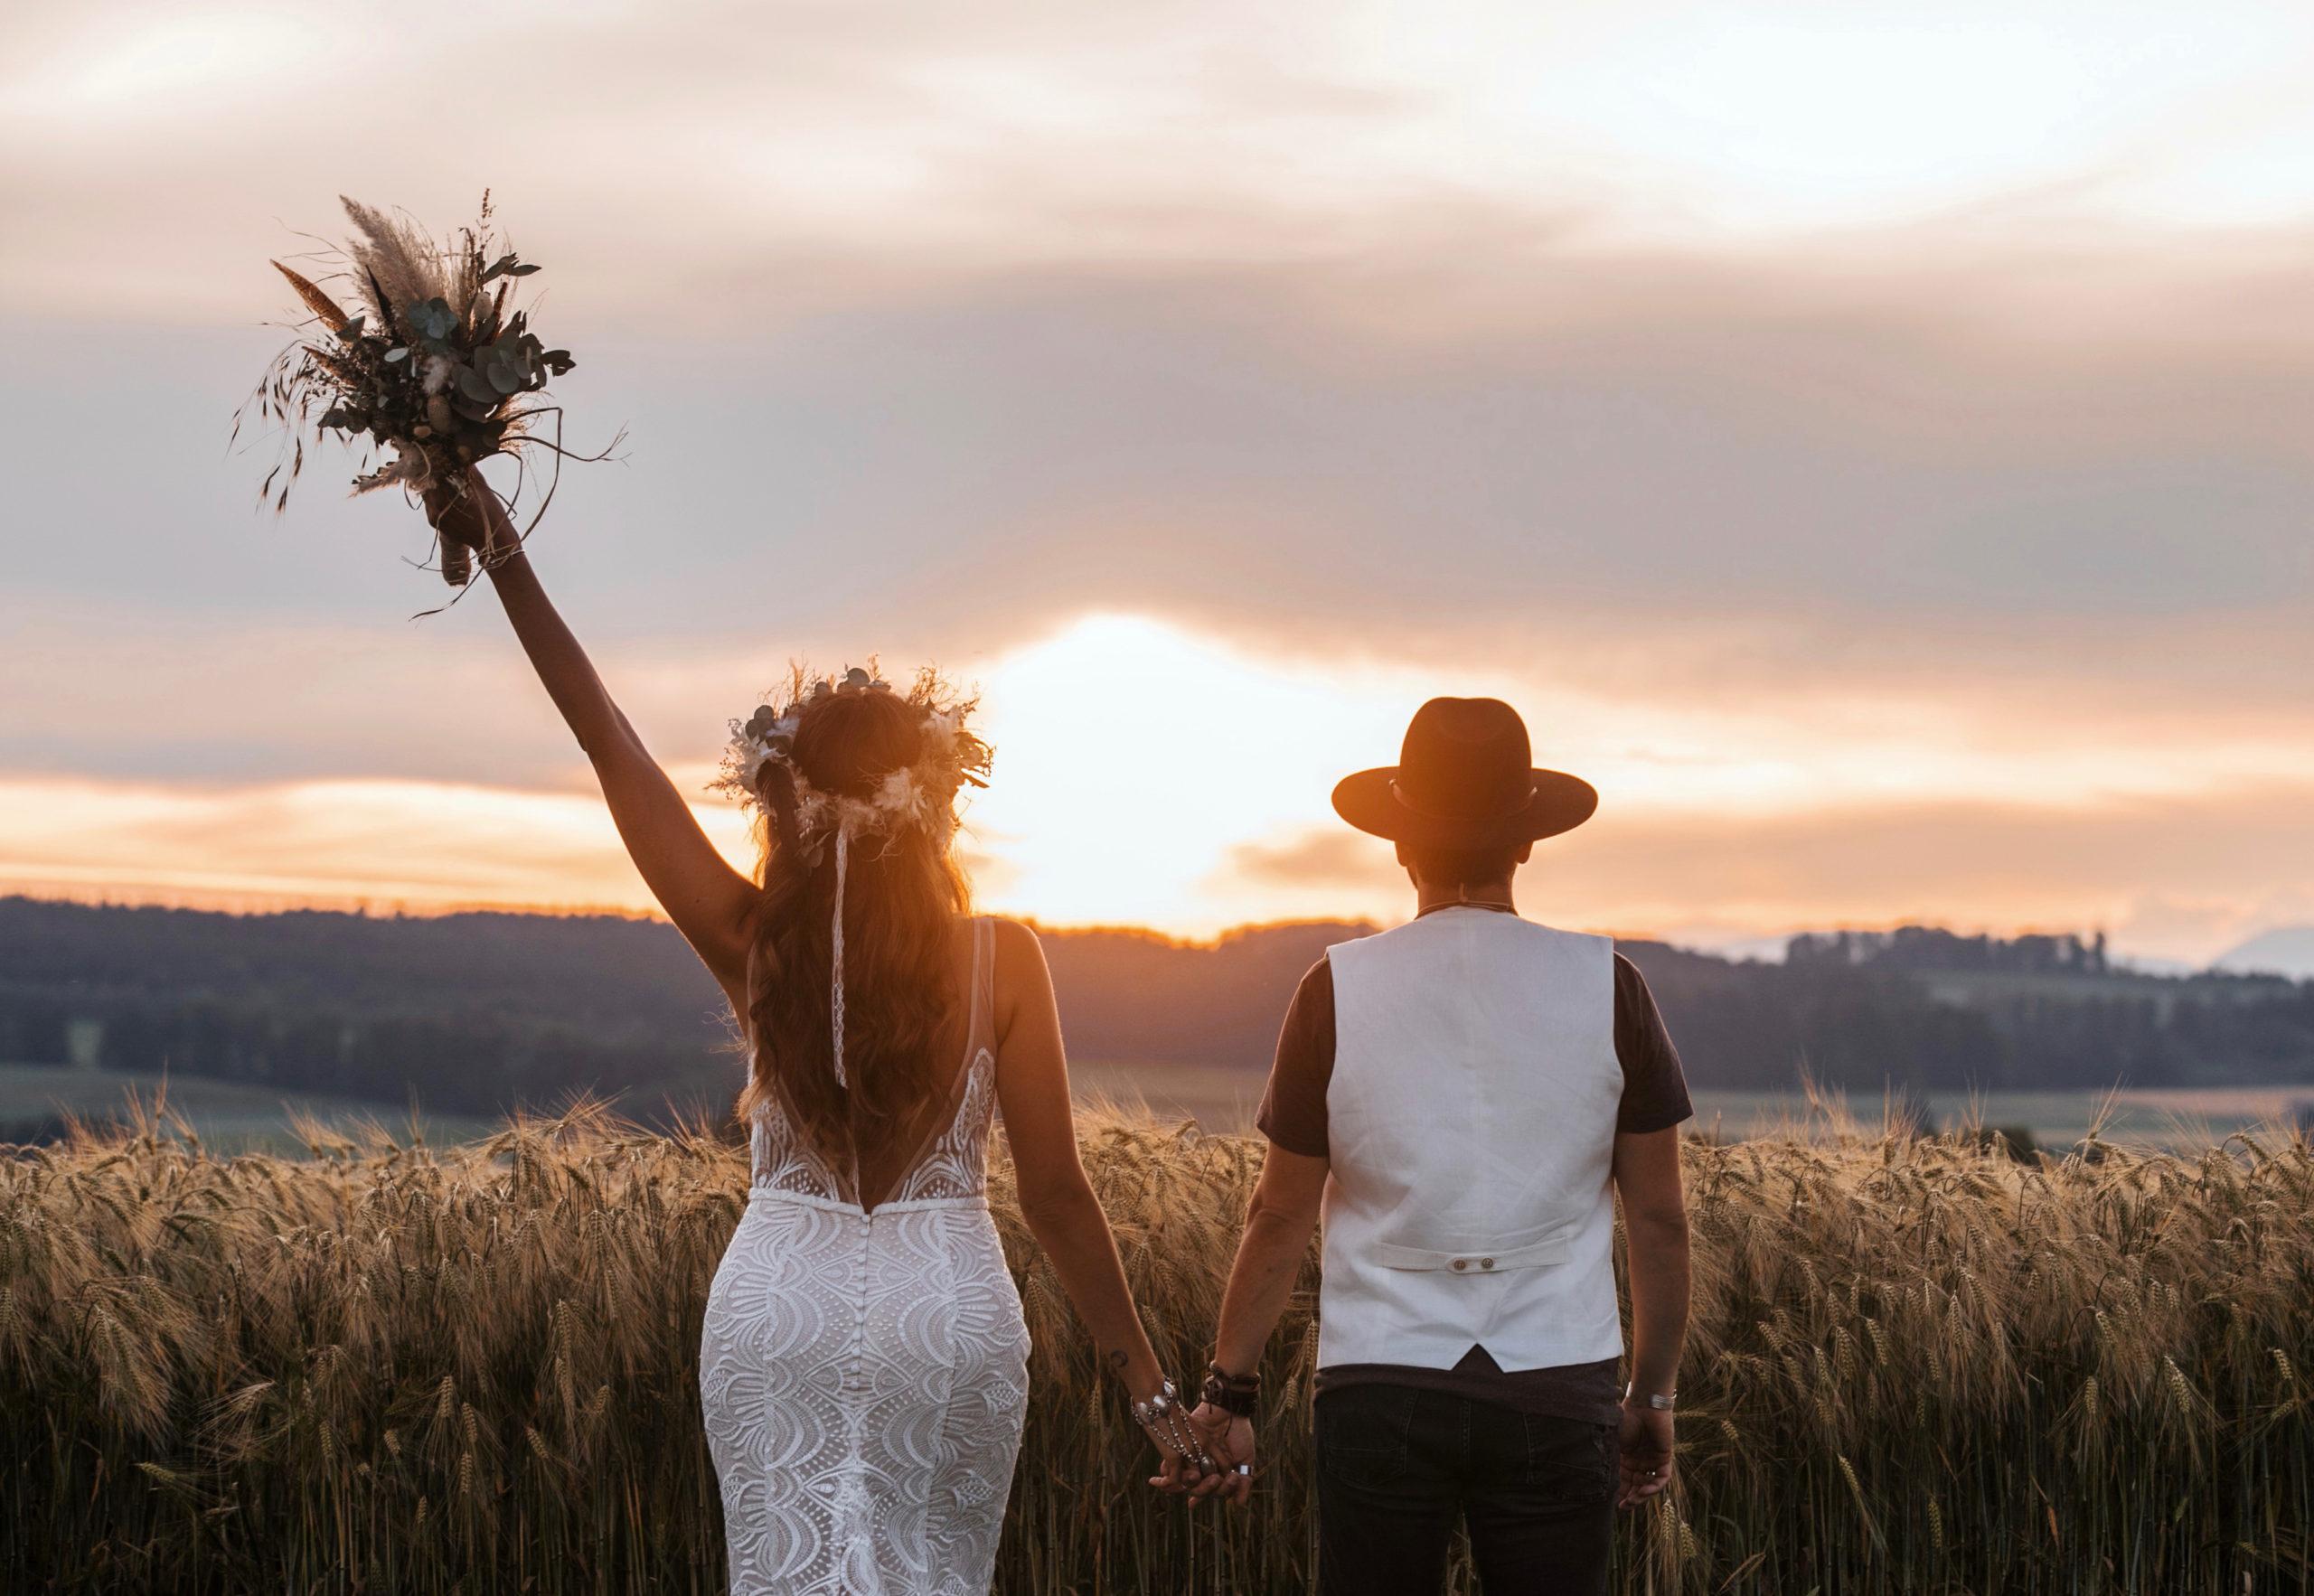 Celine_Perret_D_Day_Wedding_11